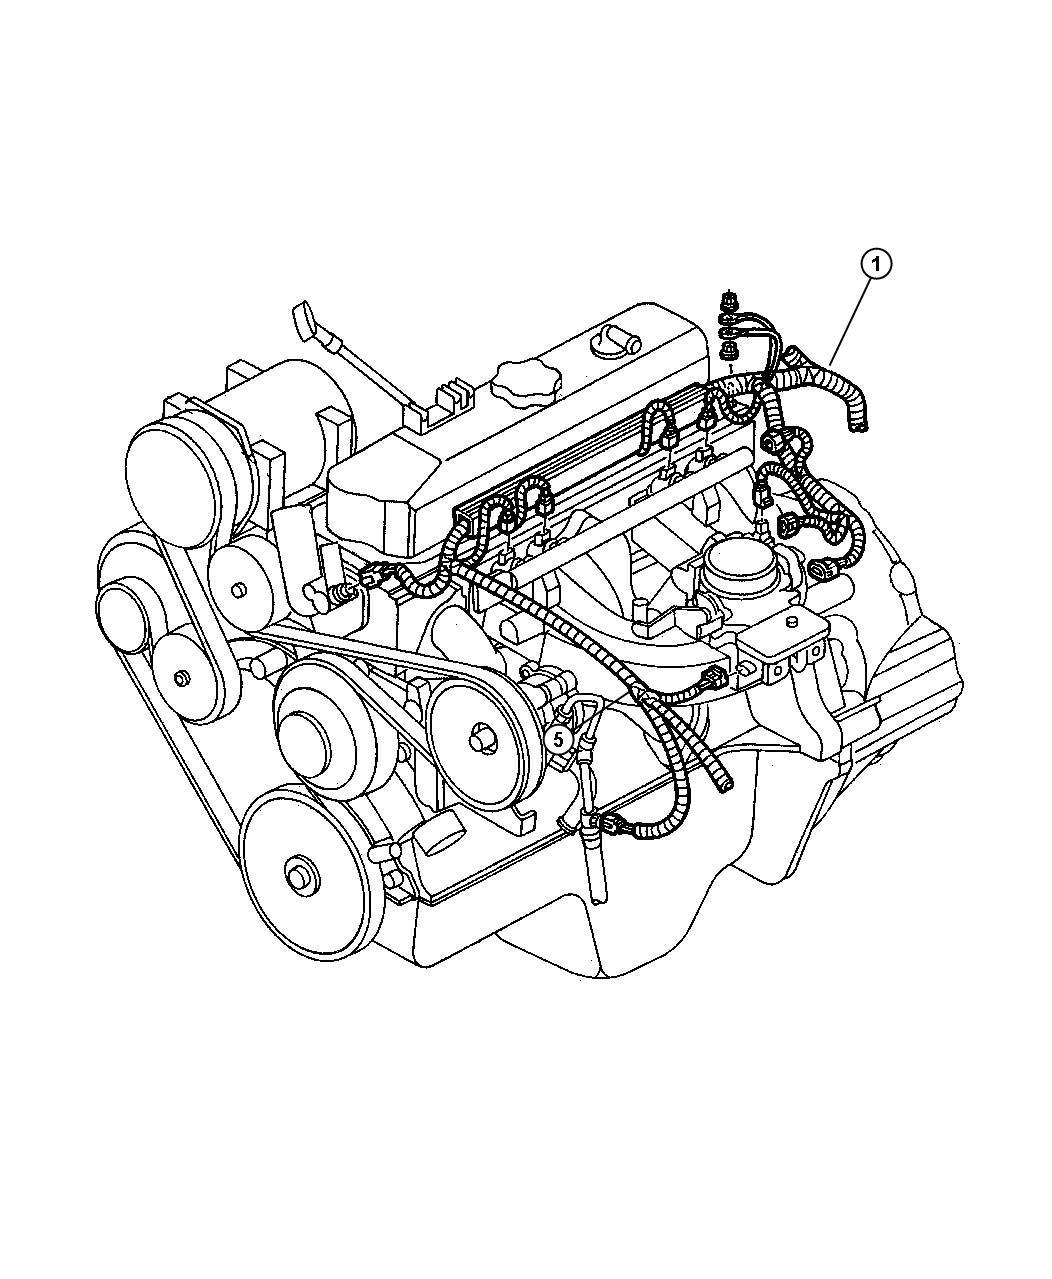 0 Dodge Dakota Custom Fit Vehicle Wiring Tow Ready Auto Electrical Altivar 61 Control Diagram 240v Plug For Fuse Box Harness 93 Camaro Vw 411 412